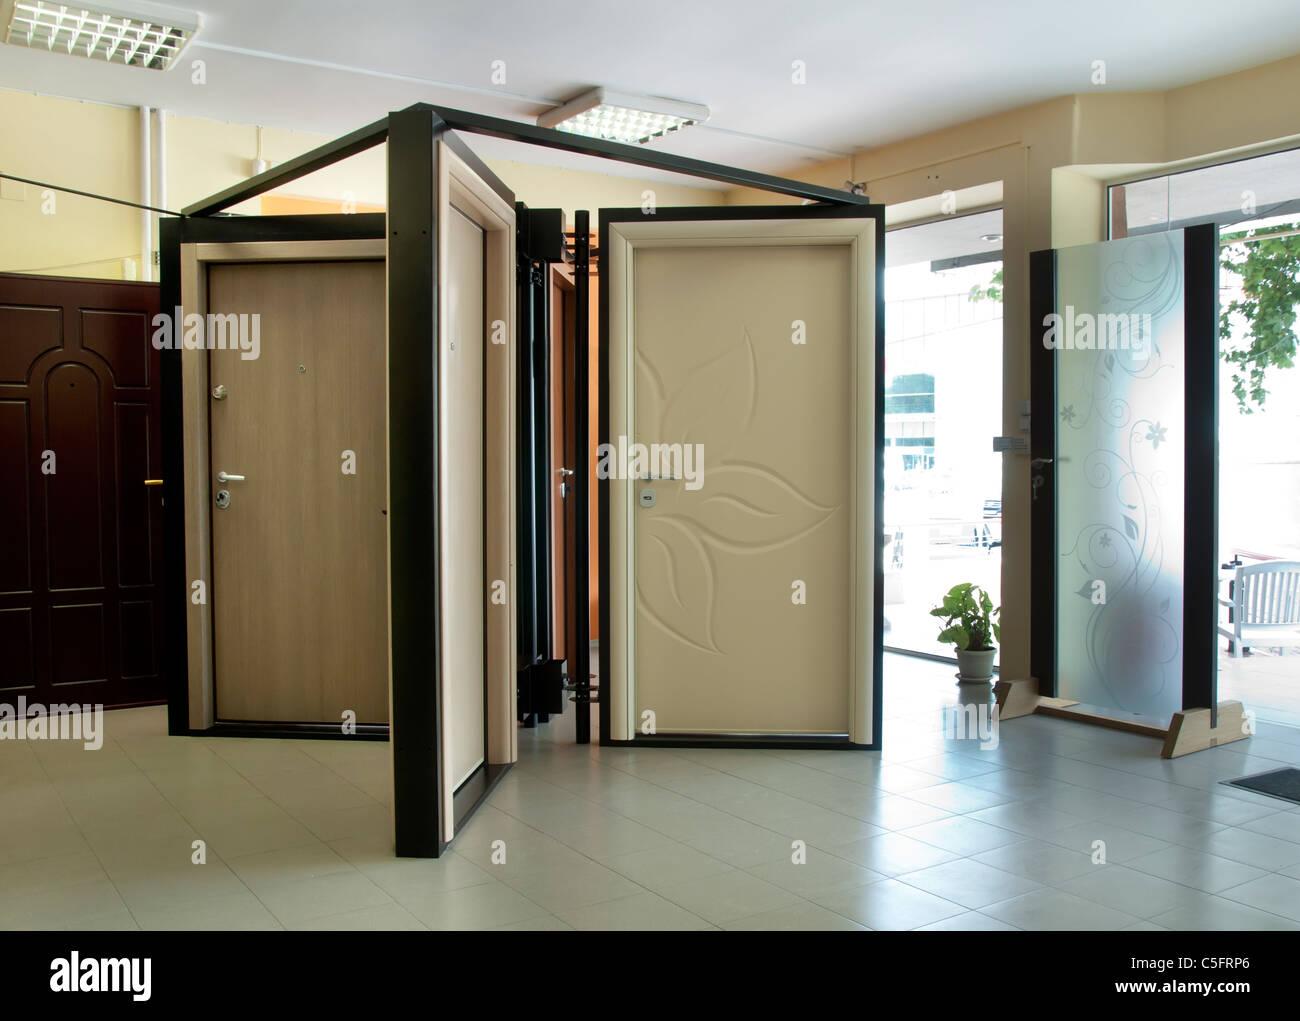 Doors shop and stillage. Sell doors & Doors shop and stillage. Sell doors Stock Photo Royalty Free ... pezcame.com